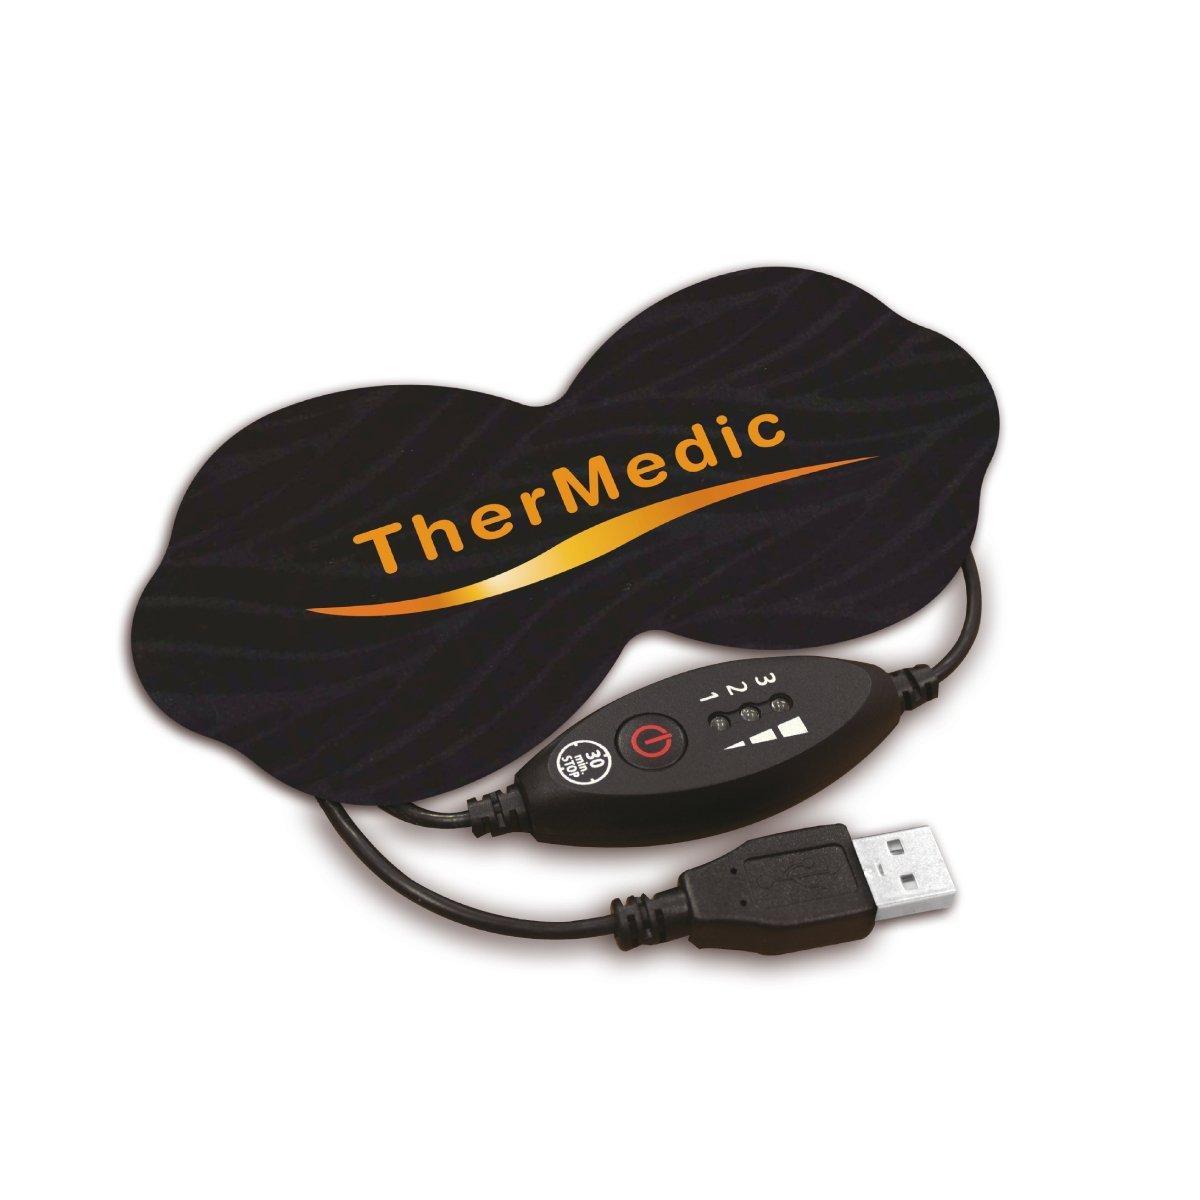 Coussinet chauffant Thermedic Prorelax 39583 pour règles douloureuses